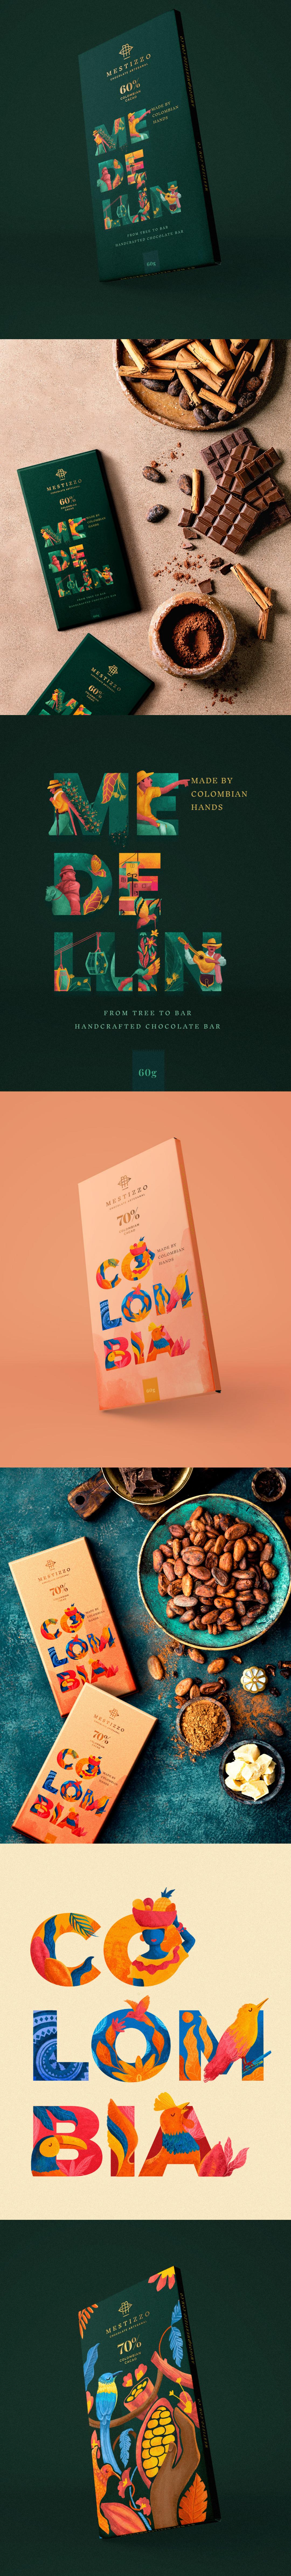 Branding,Graphic Design,Illustration